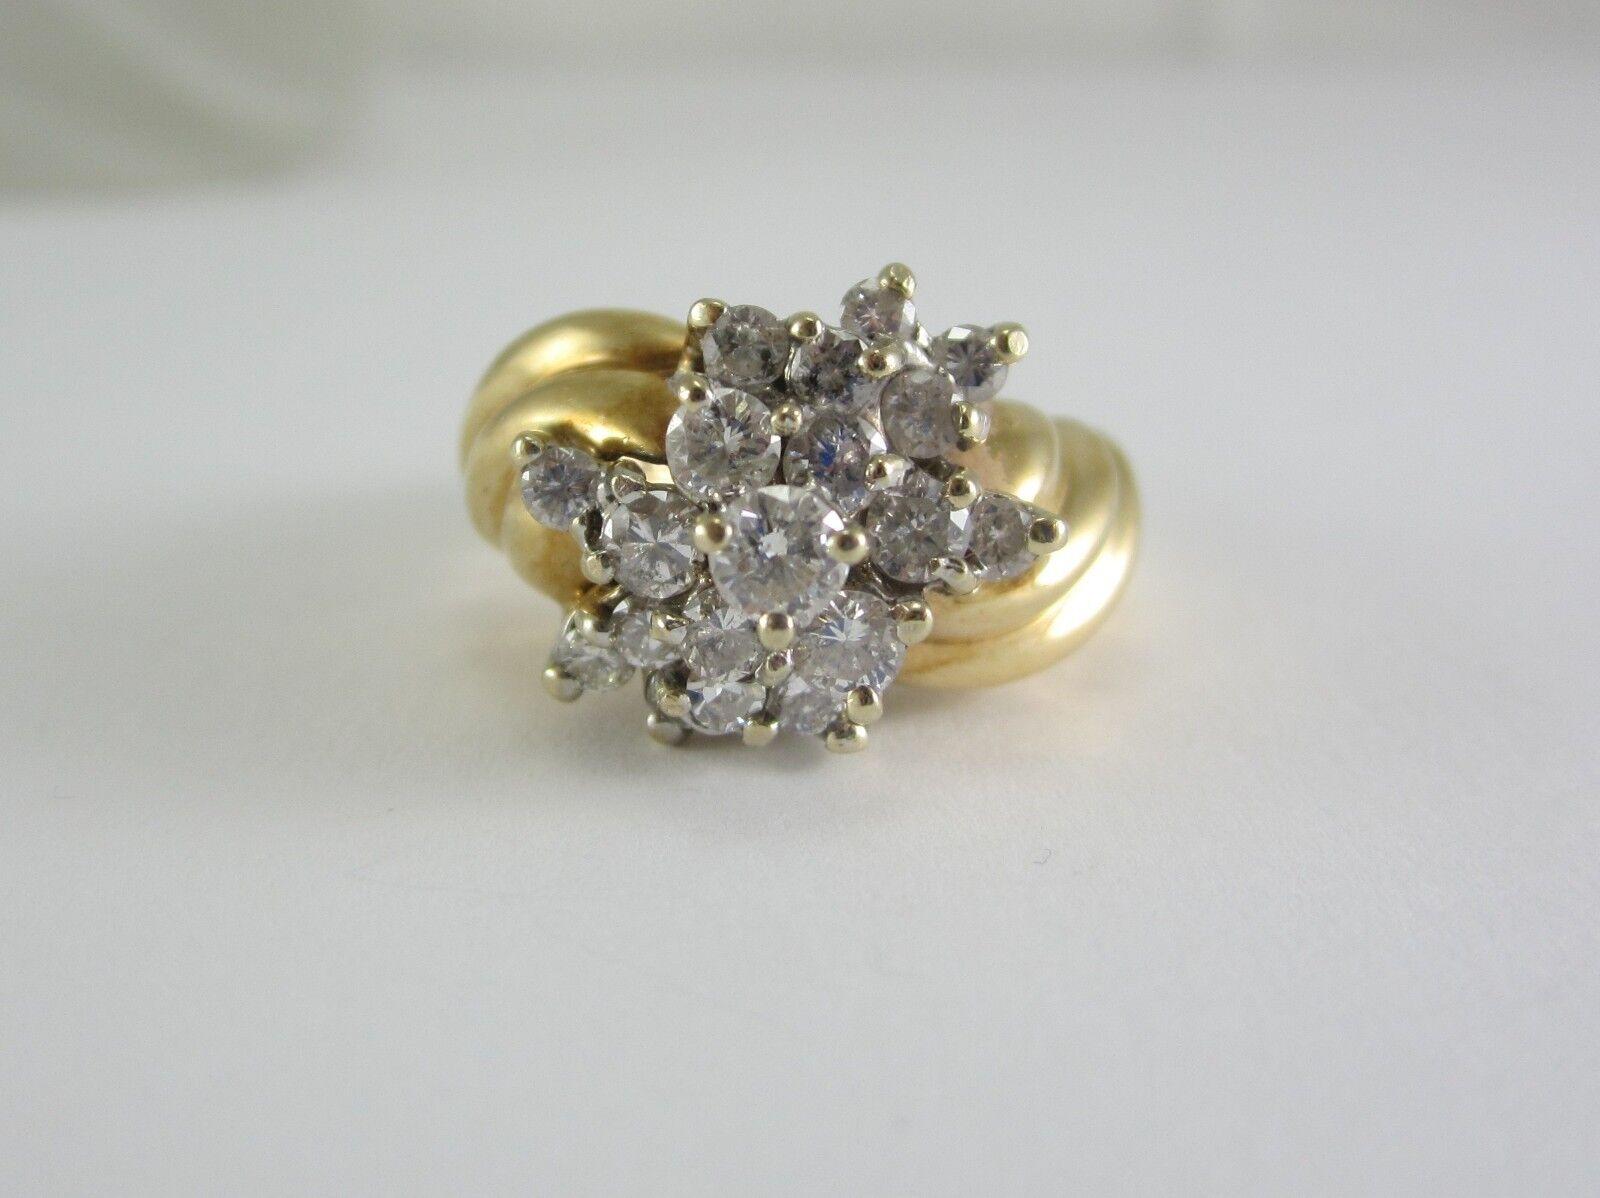 BEAUTIFUL LADIES 14K gold CLUSTER RING 7.0 GRAMS 0.87CT.